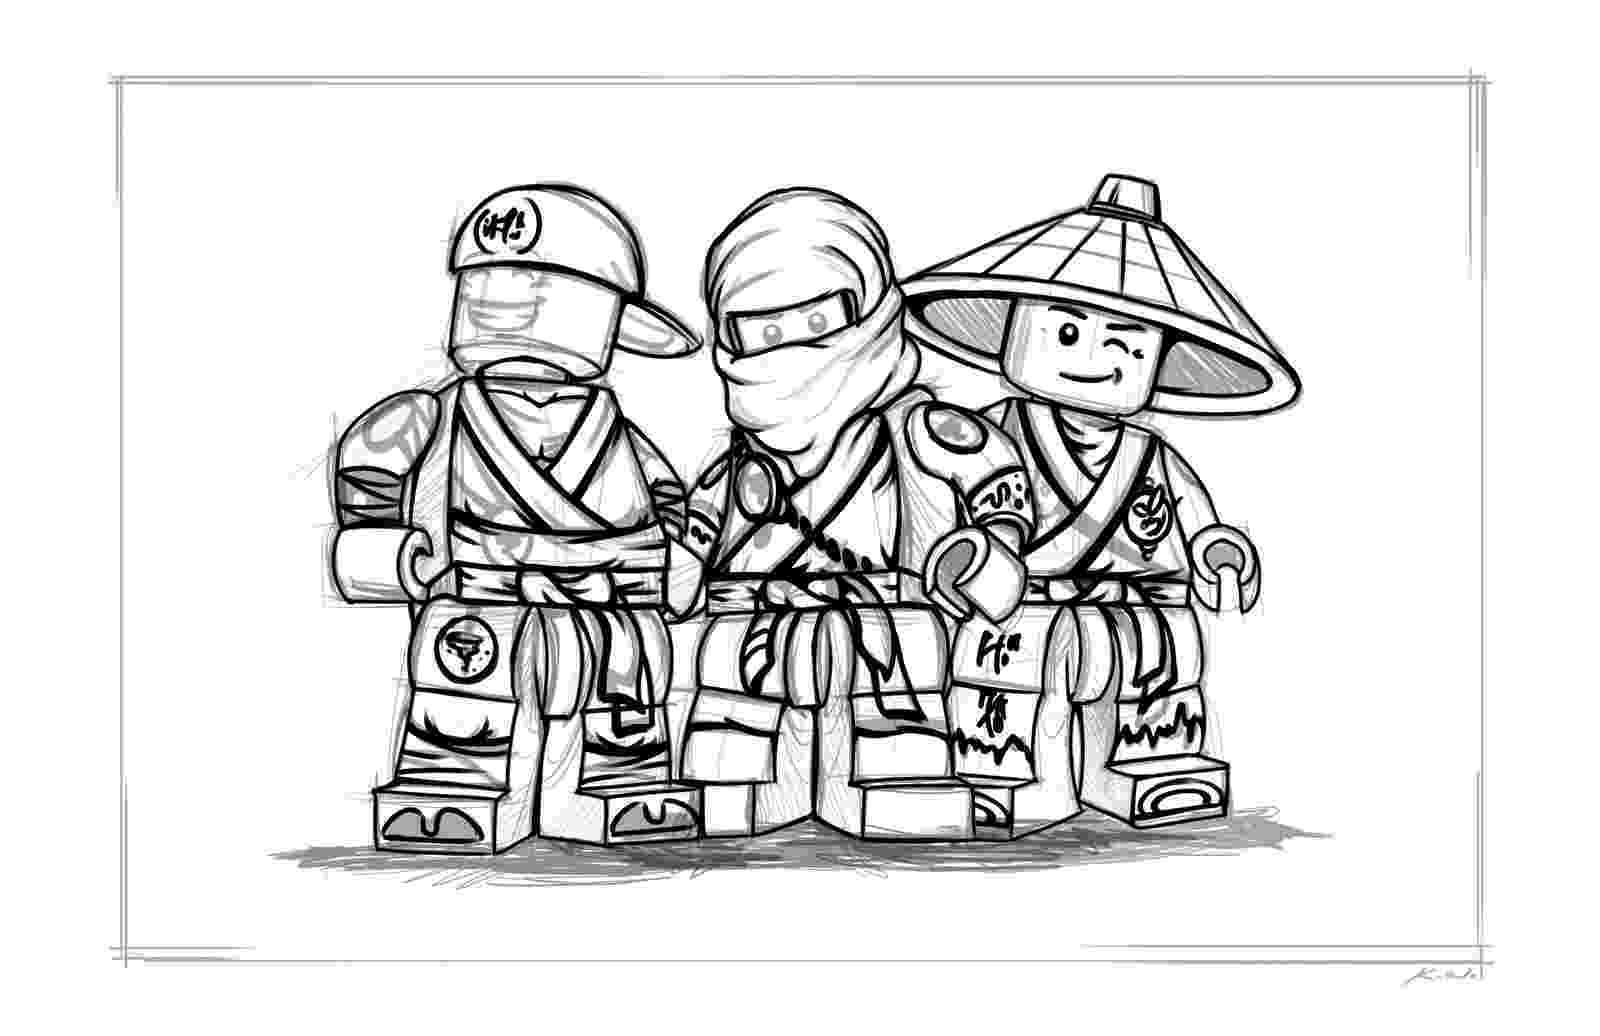 lego ninjago coloring sheets free printable ninjago coloring pages for kids cool2bkids lego coloring sheets ninjago